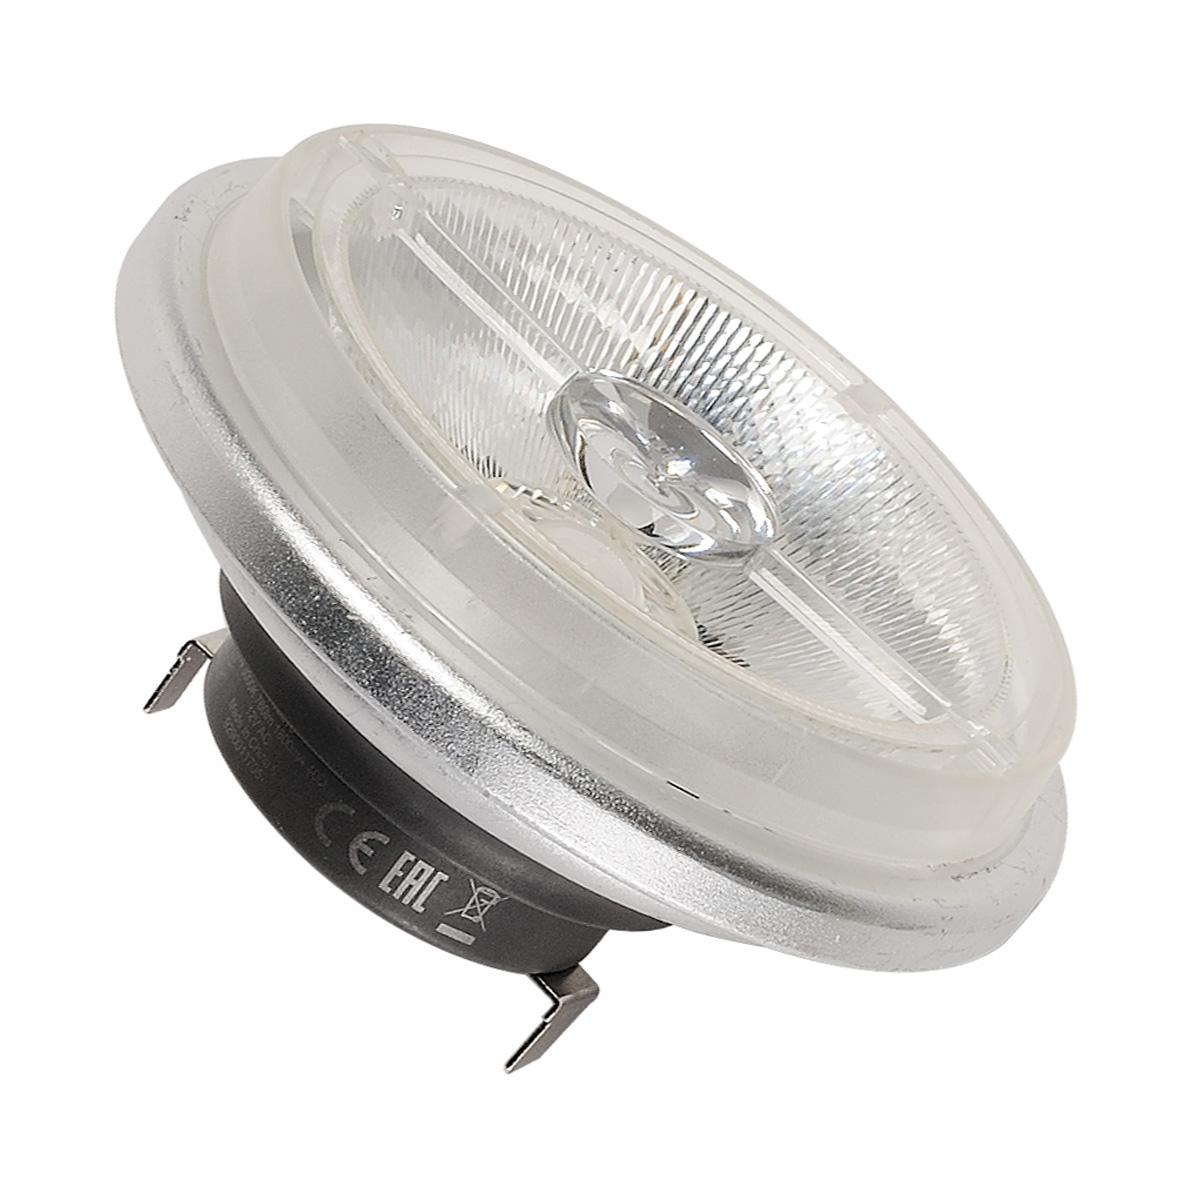 Philips Master LED AR111, CRI90, 15W, 40°, 2700K, d